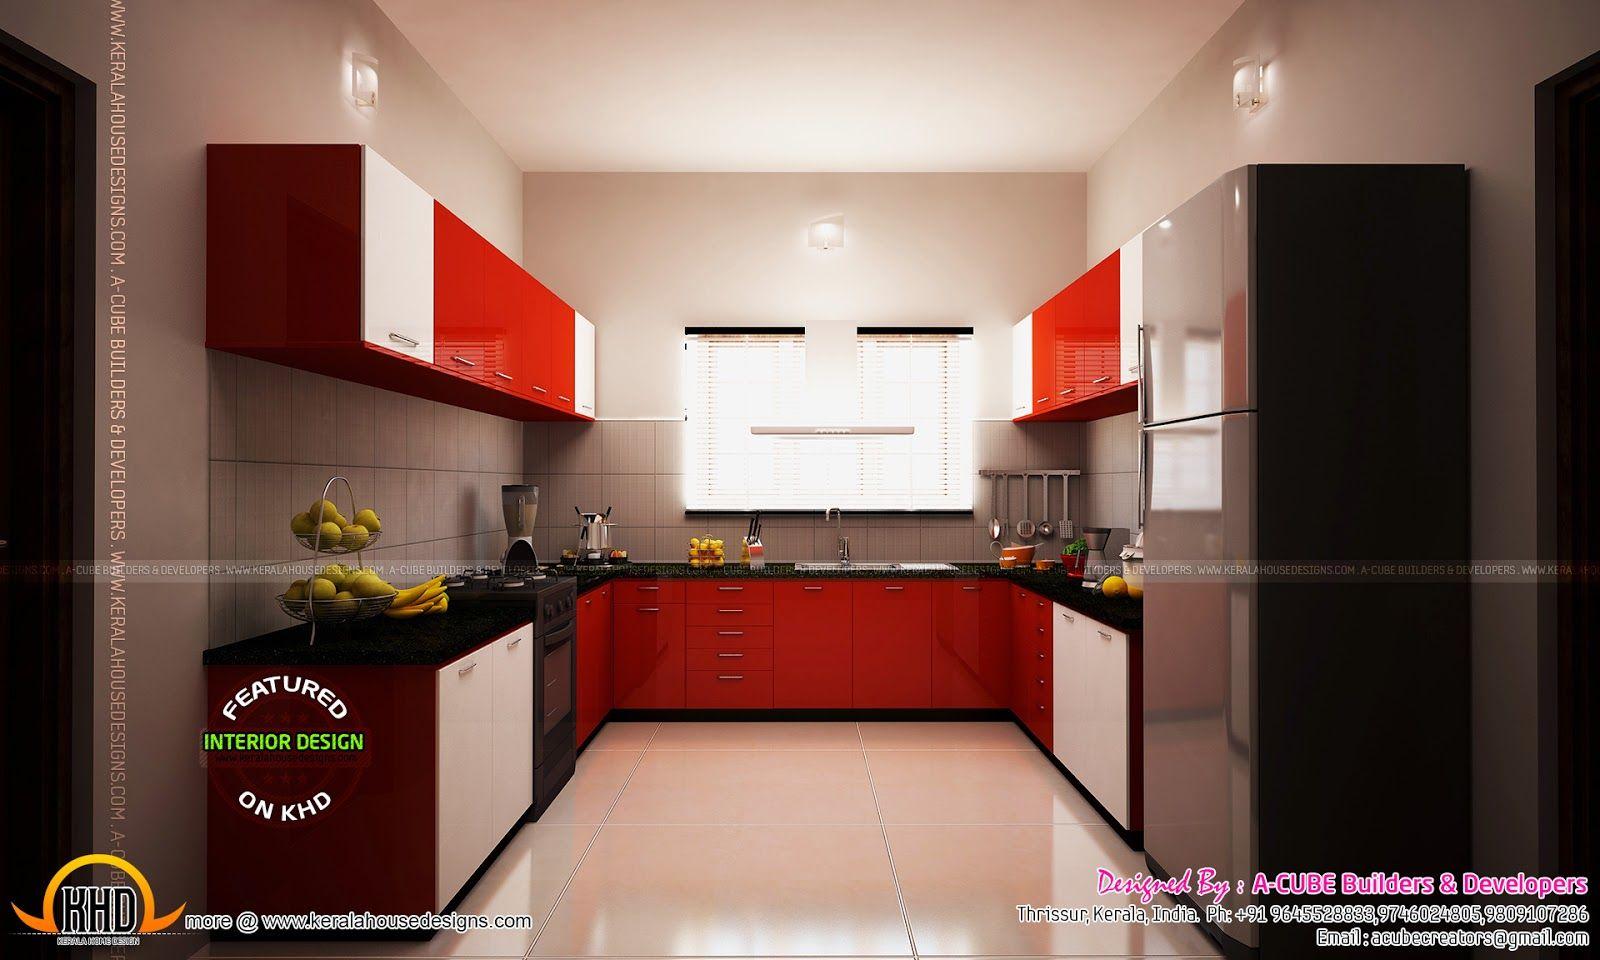 Kerala Kitchen Interior Design Modular Kitchen Kerala Kerala Kitchen Kitchen Interior Designs